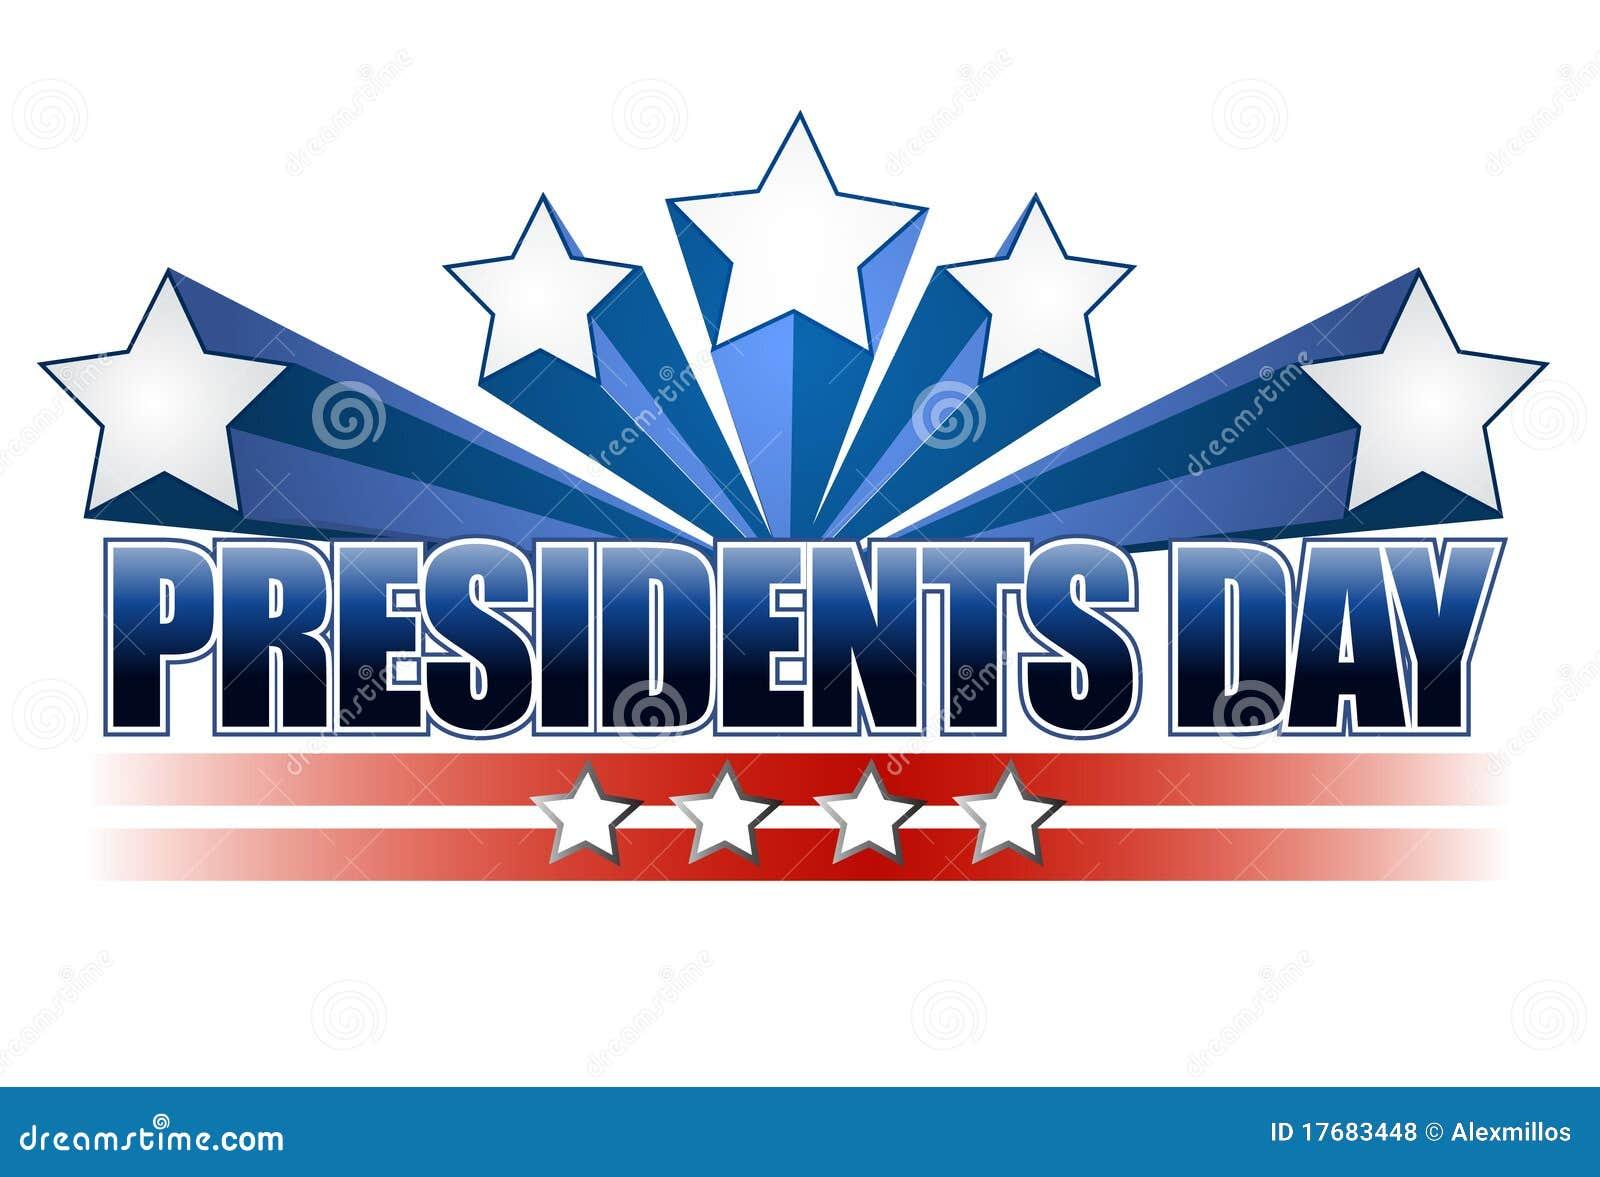 Presidents Day Stock Illustrations 7 162 Presidents Day Stock Illustrations Vectors Clipart Dreamstime